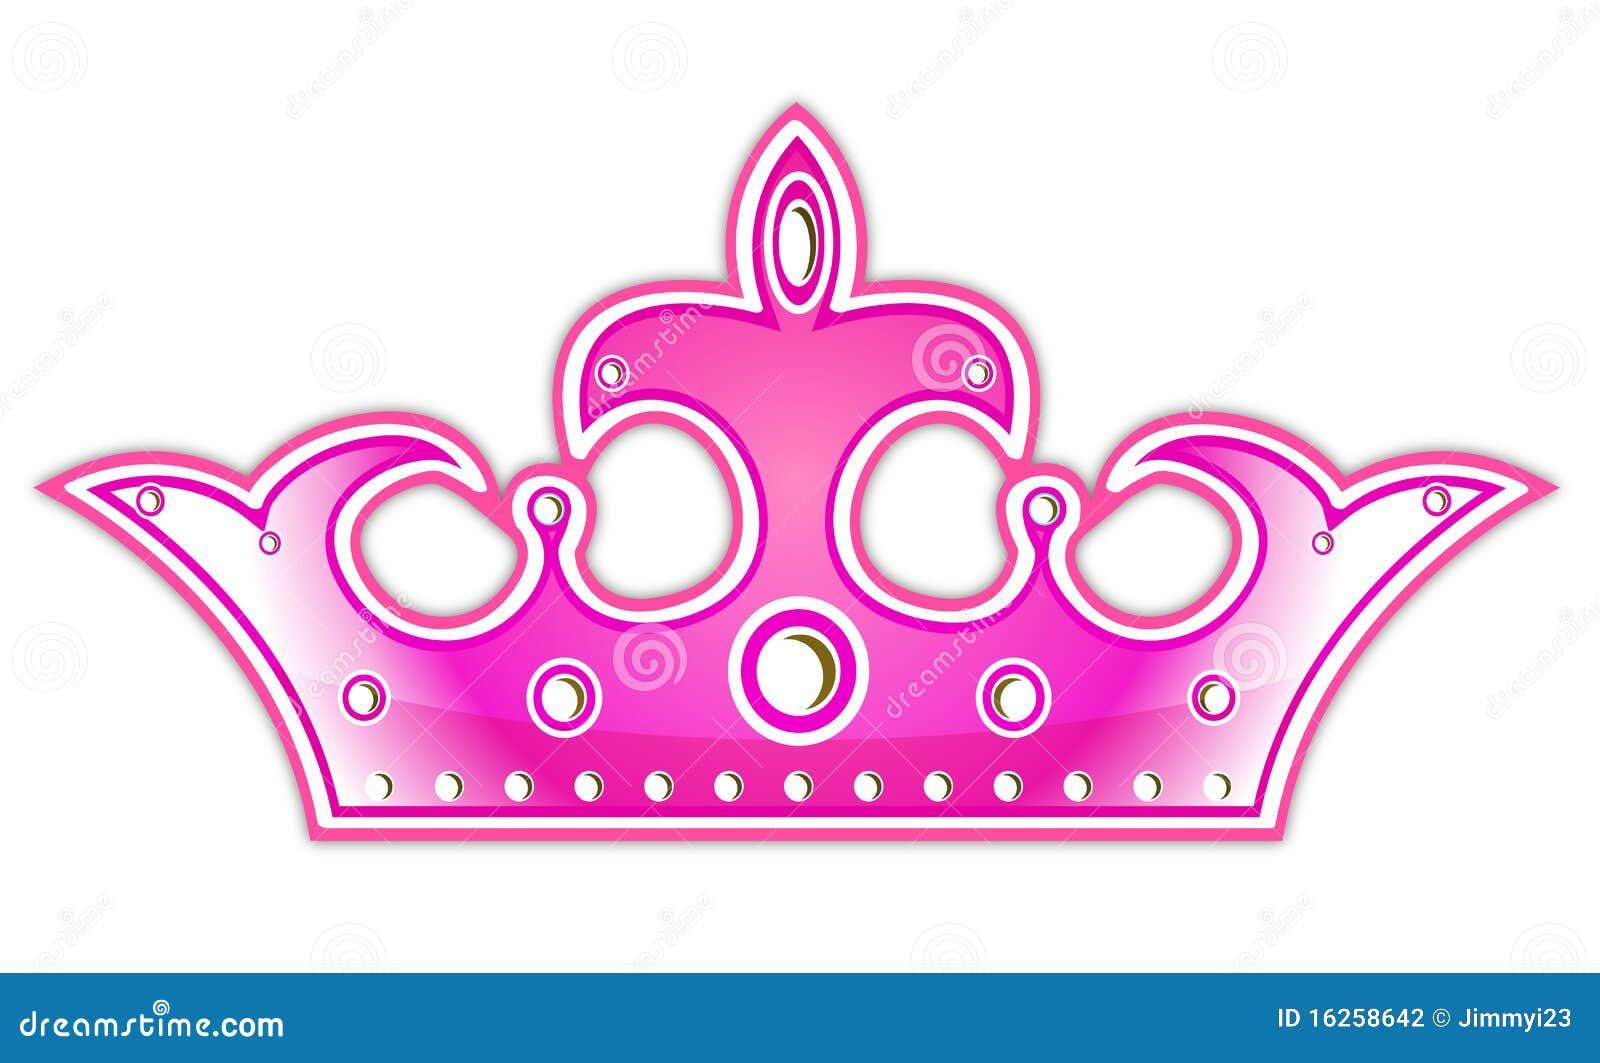 princess hat clip art - photo #37